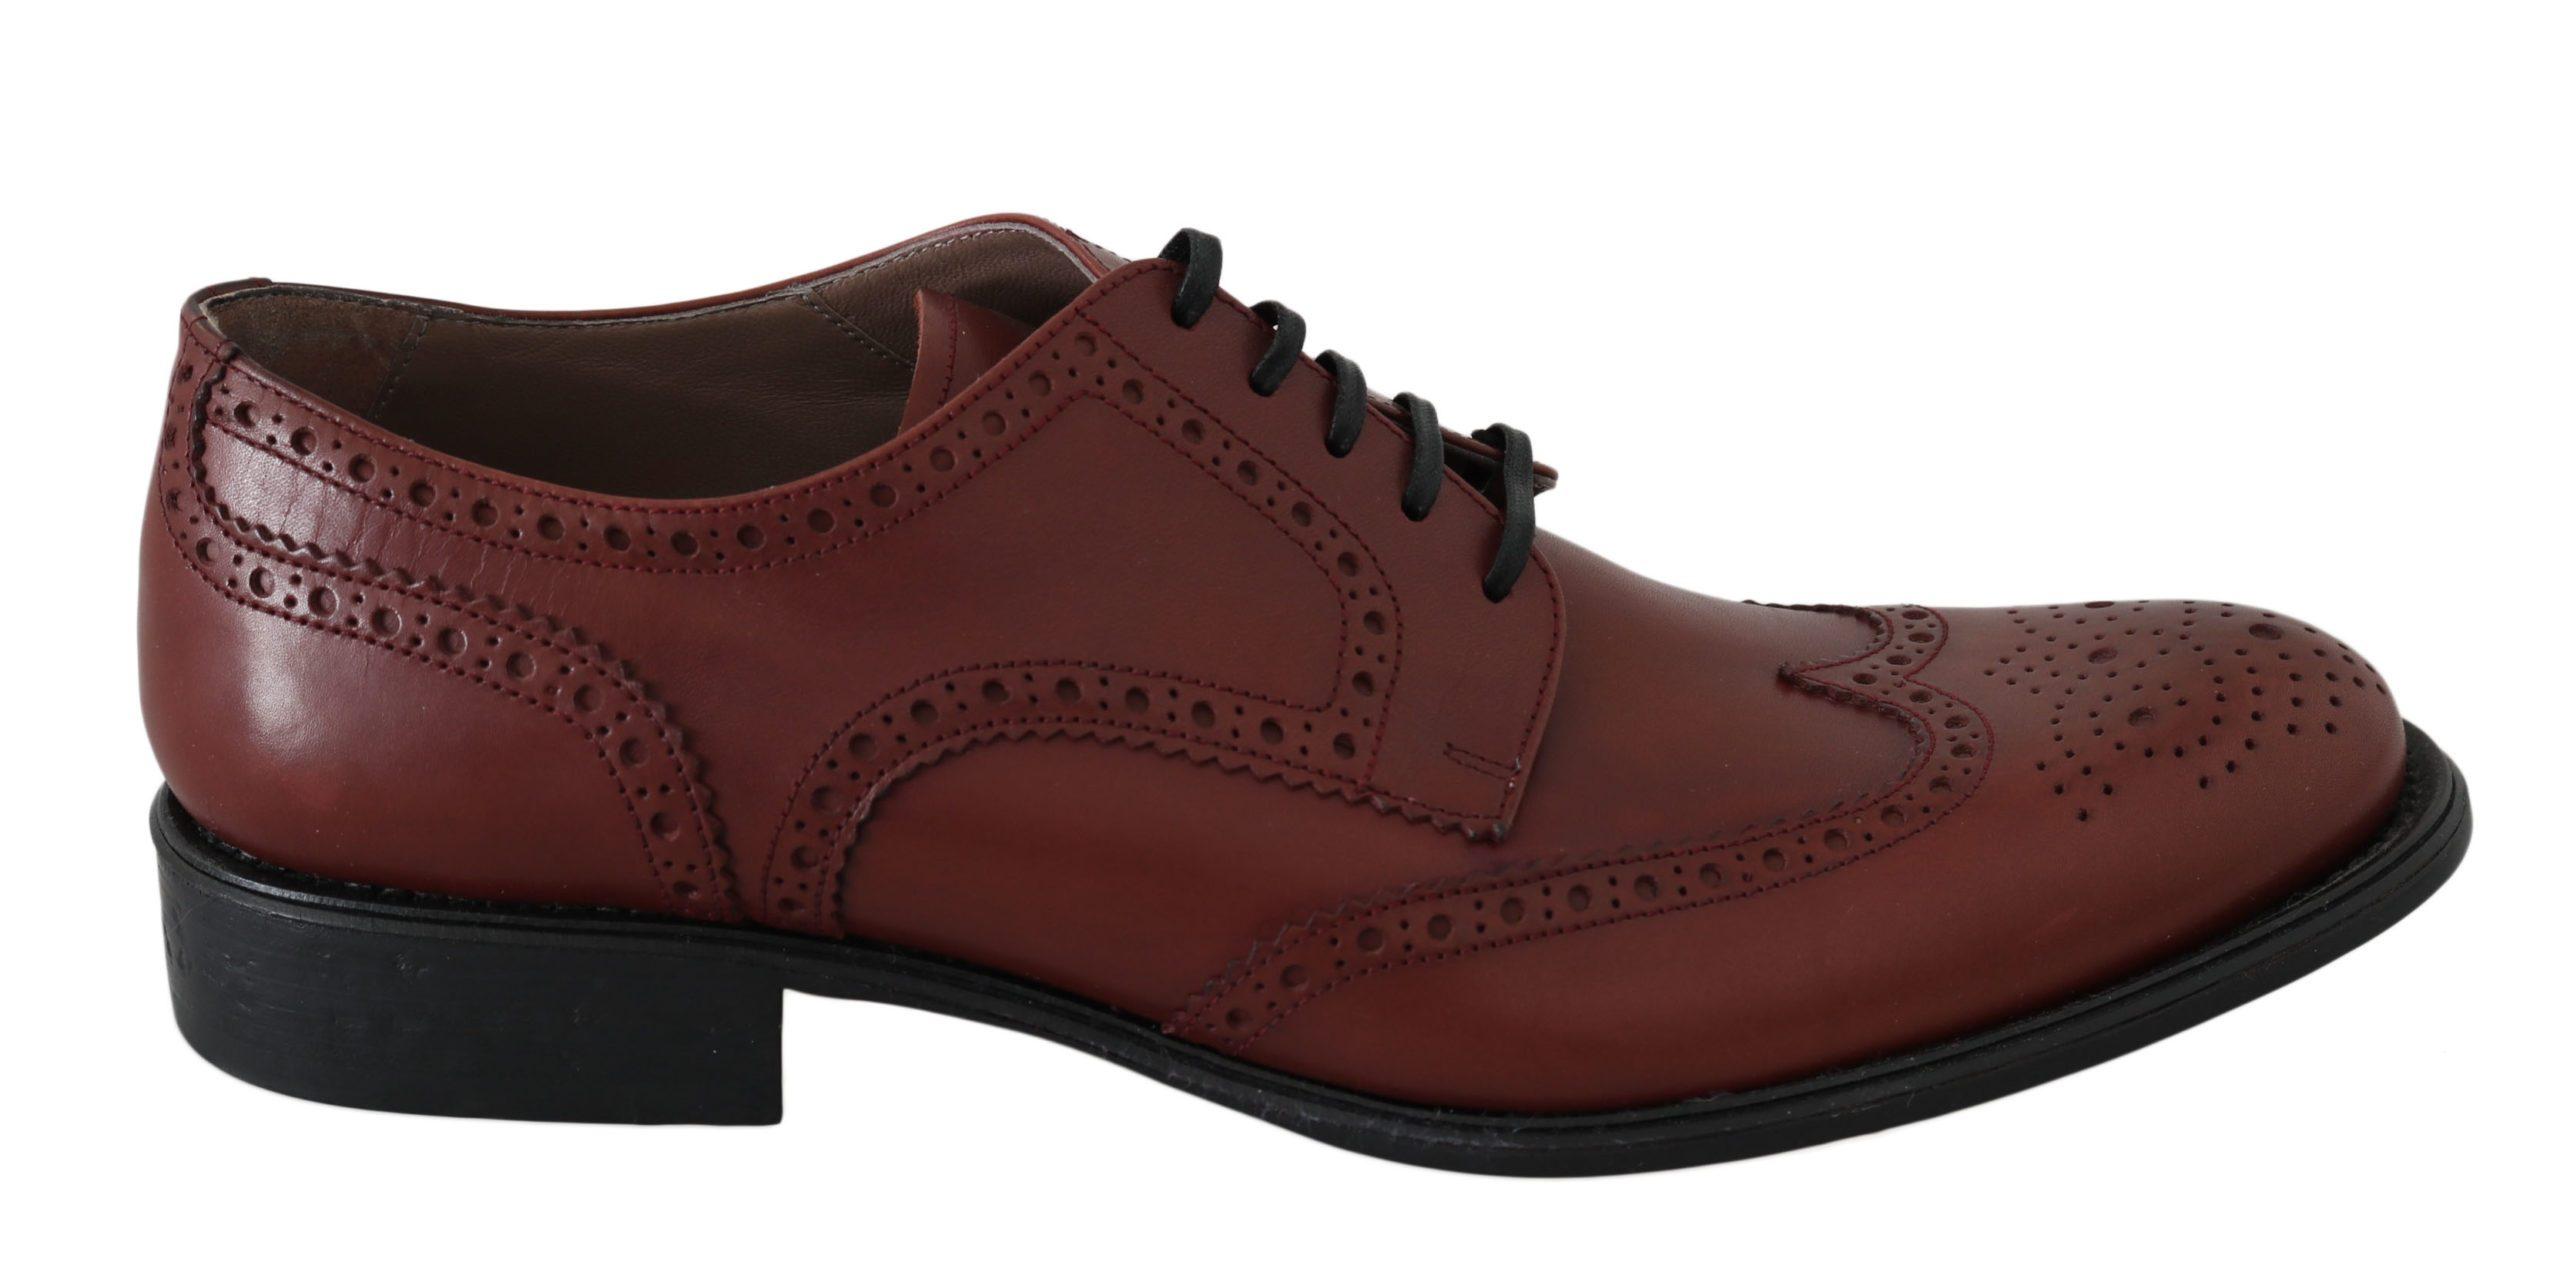 Dolce & Gabbana Men's Leather Brogue Shoes Red MV2495 - EU42.5/US9.5